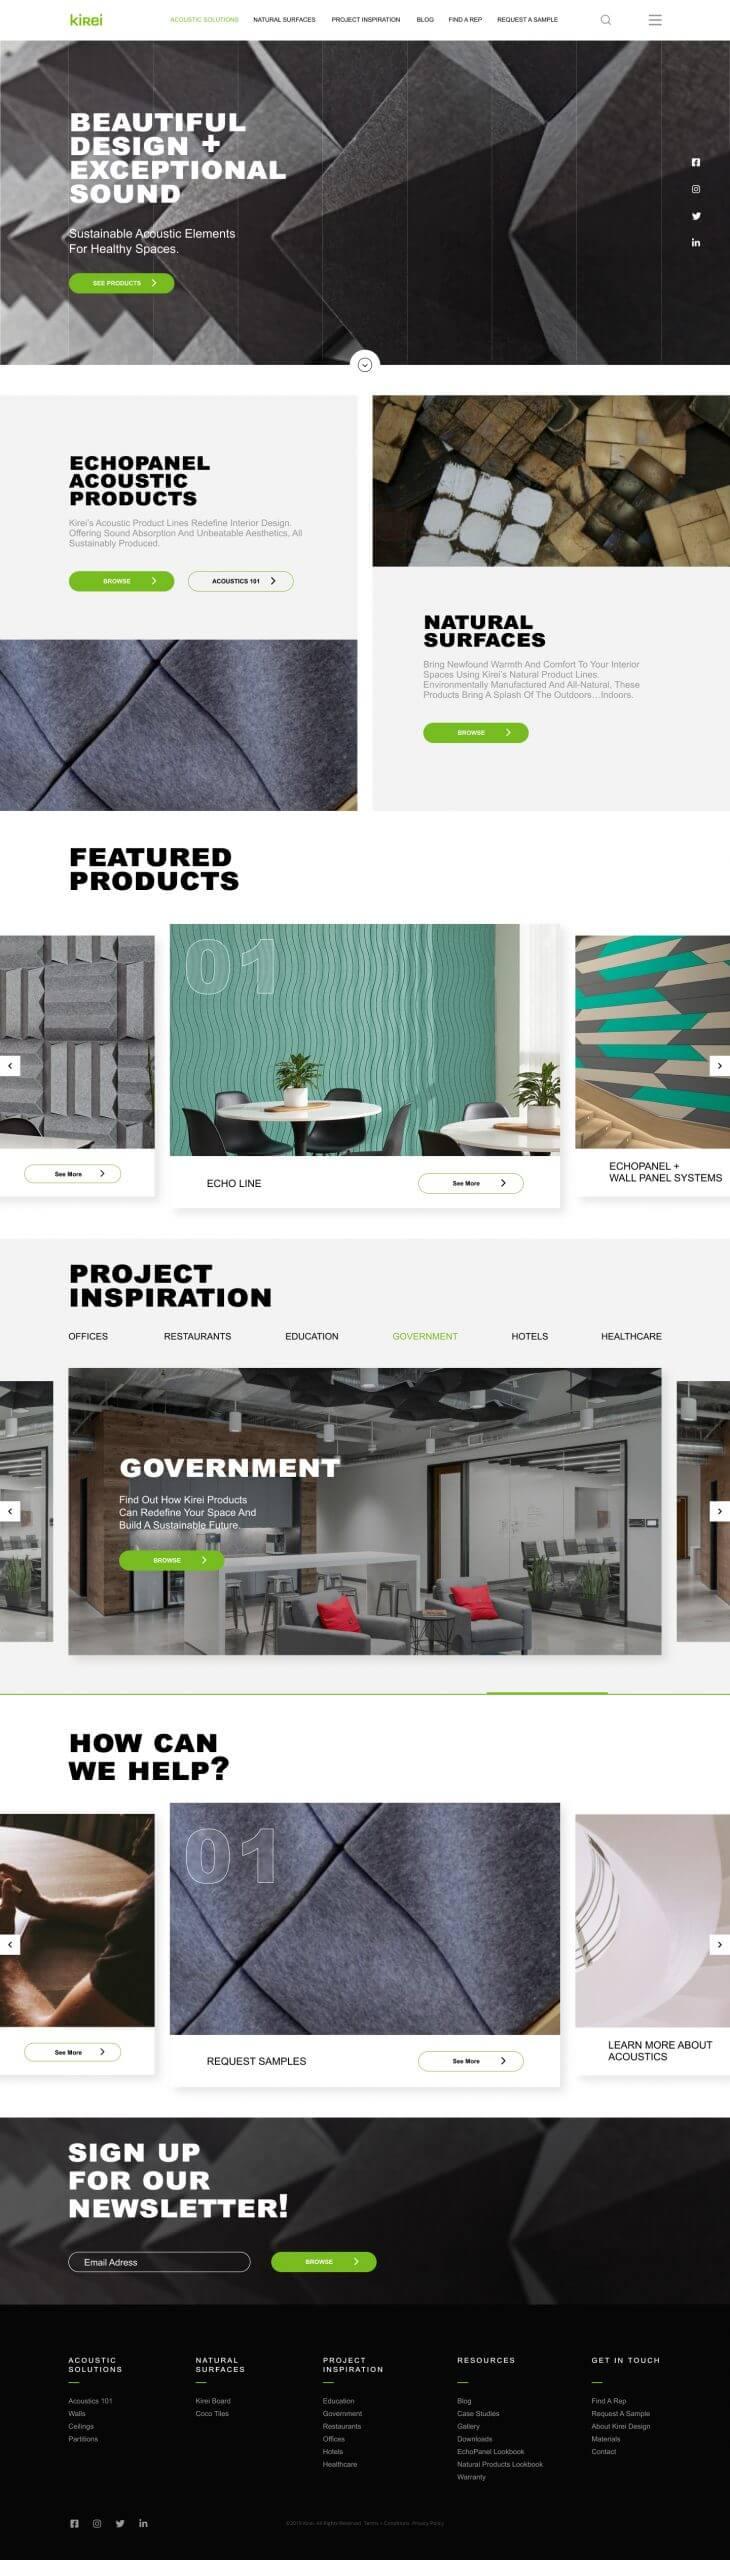 Kirei Website Concept